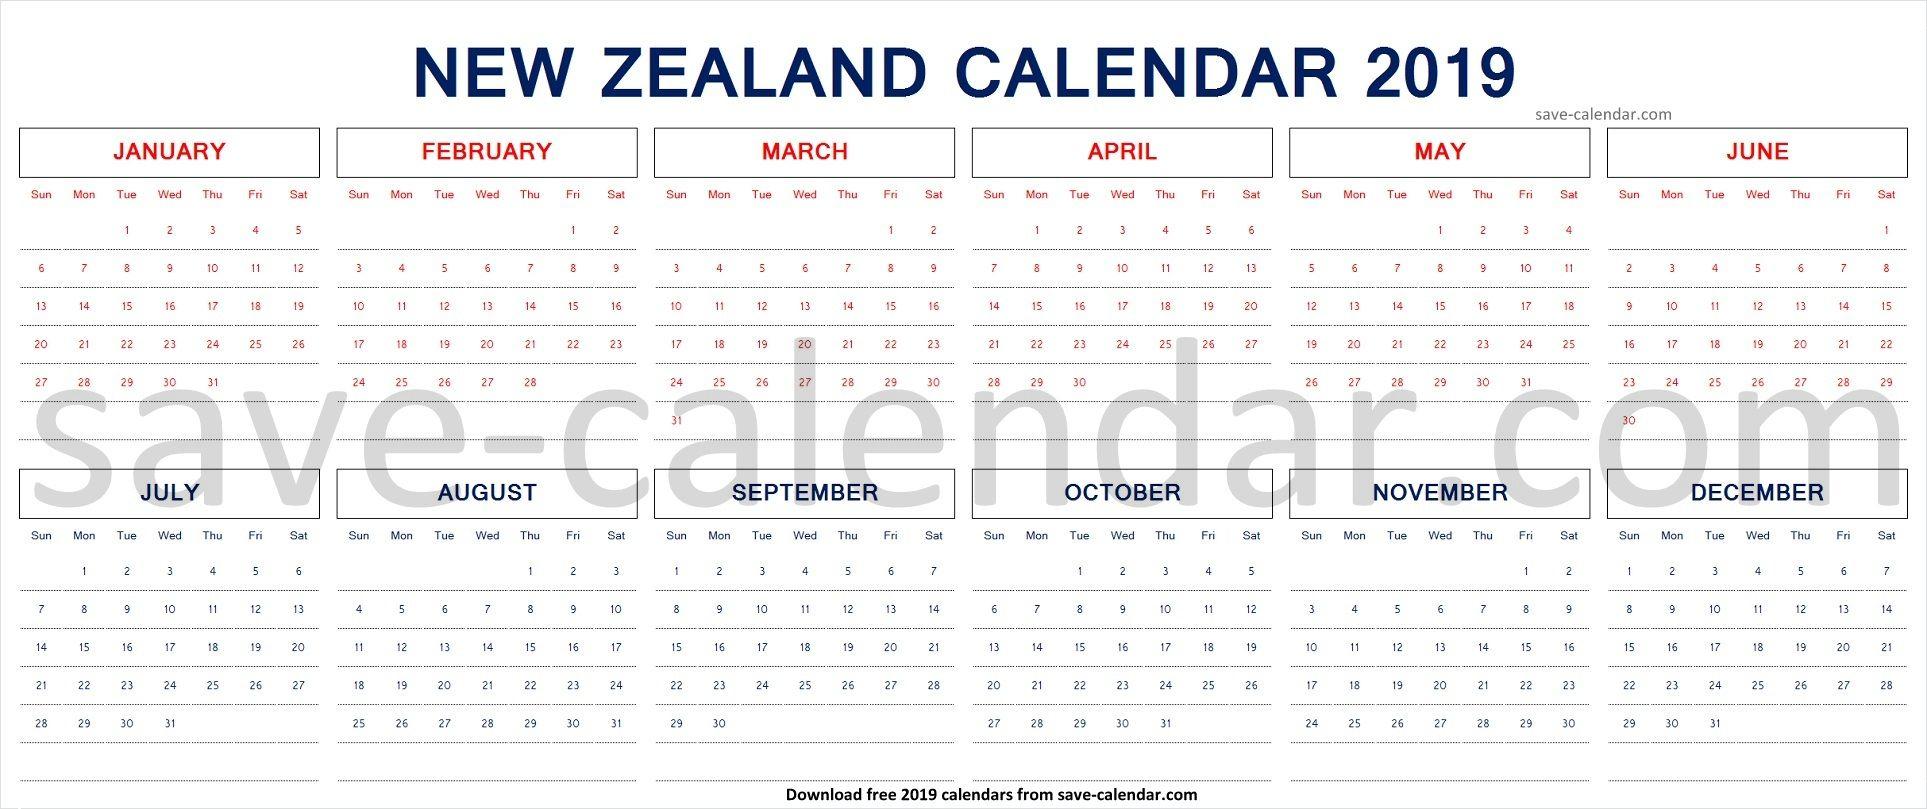 2019 Calendar Nz With Public Holidays | 2019 Calendar